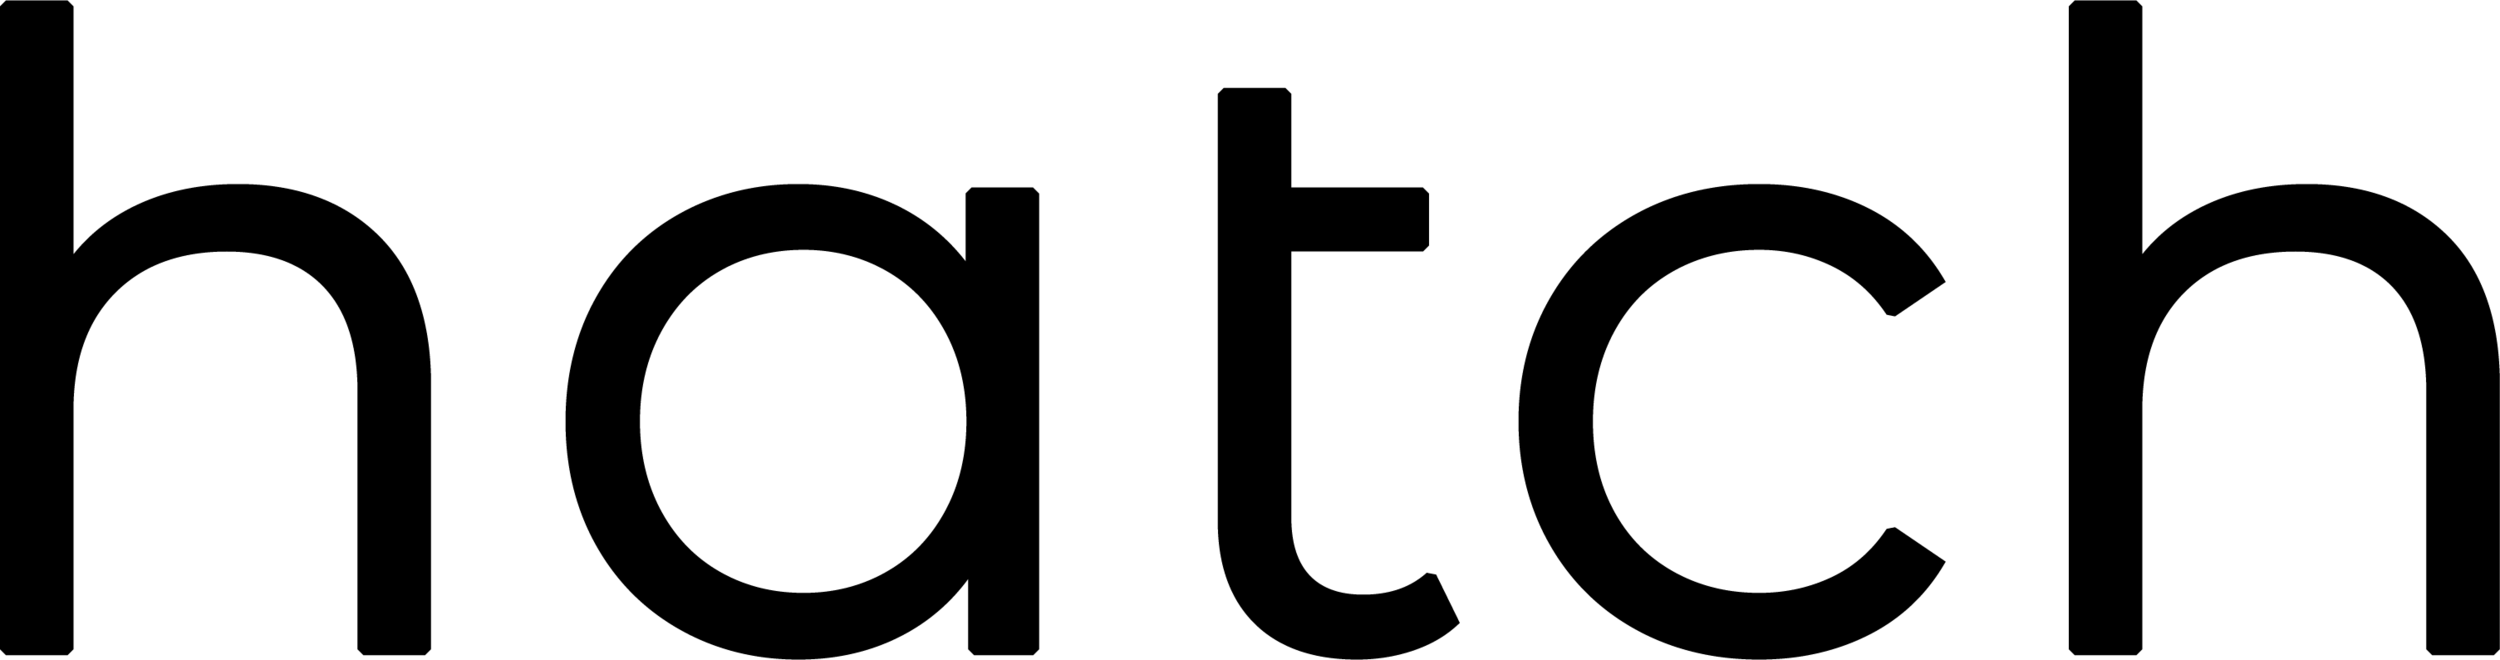 hatch_logo_-_large (1).png